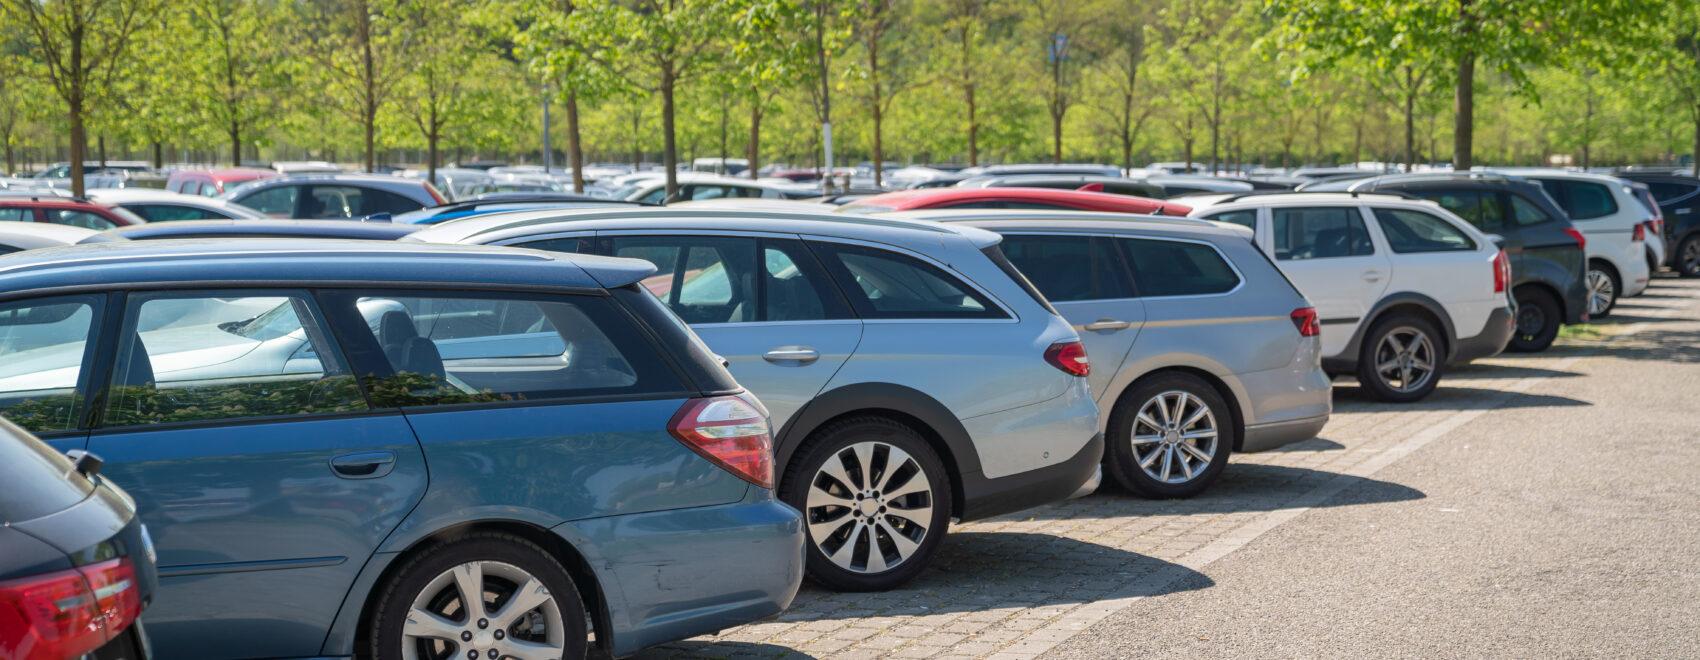 Tip for Vehicle Break-in Prevention